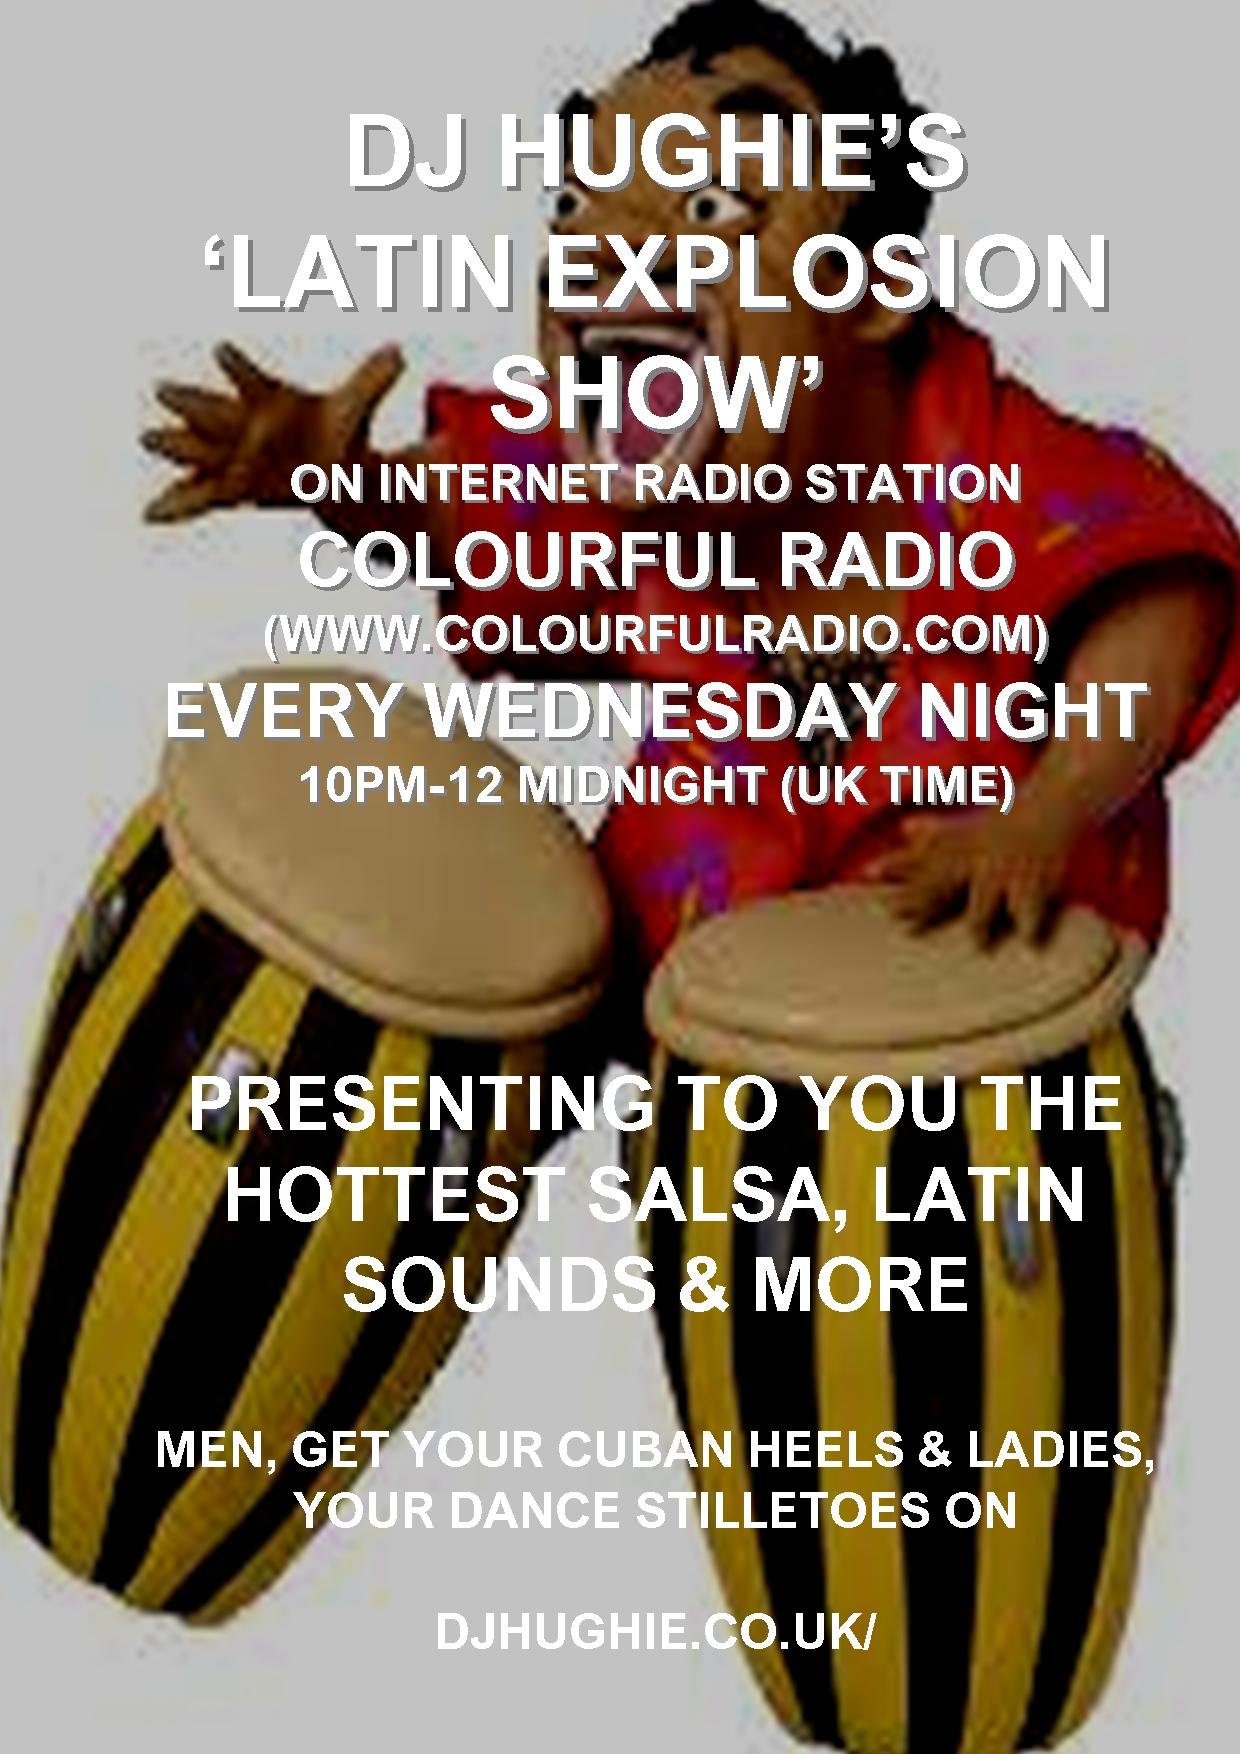 DJ Hughie's Latin Explosion Show